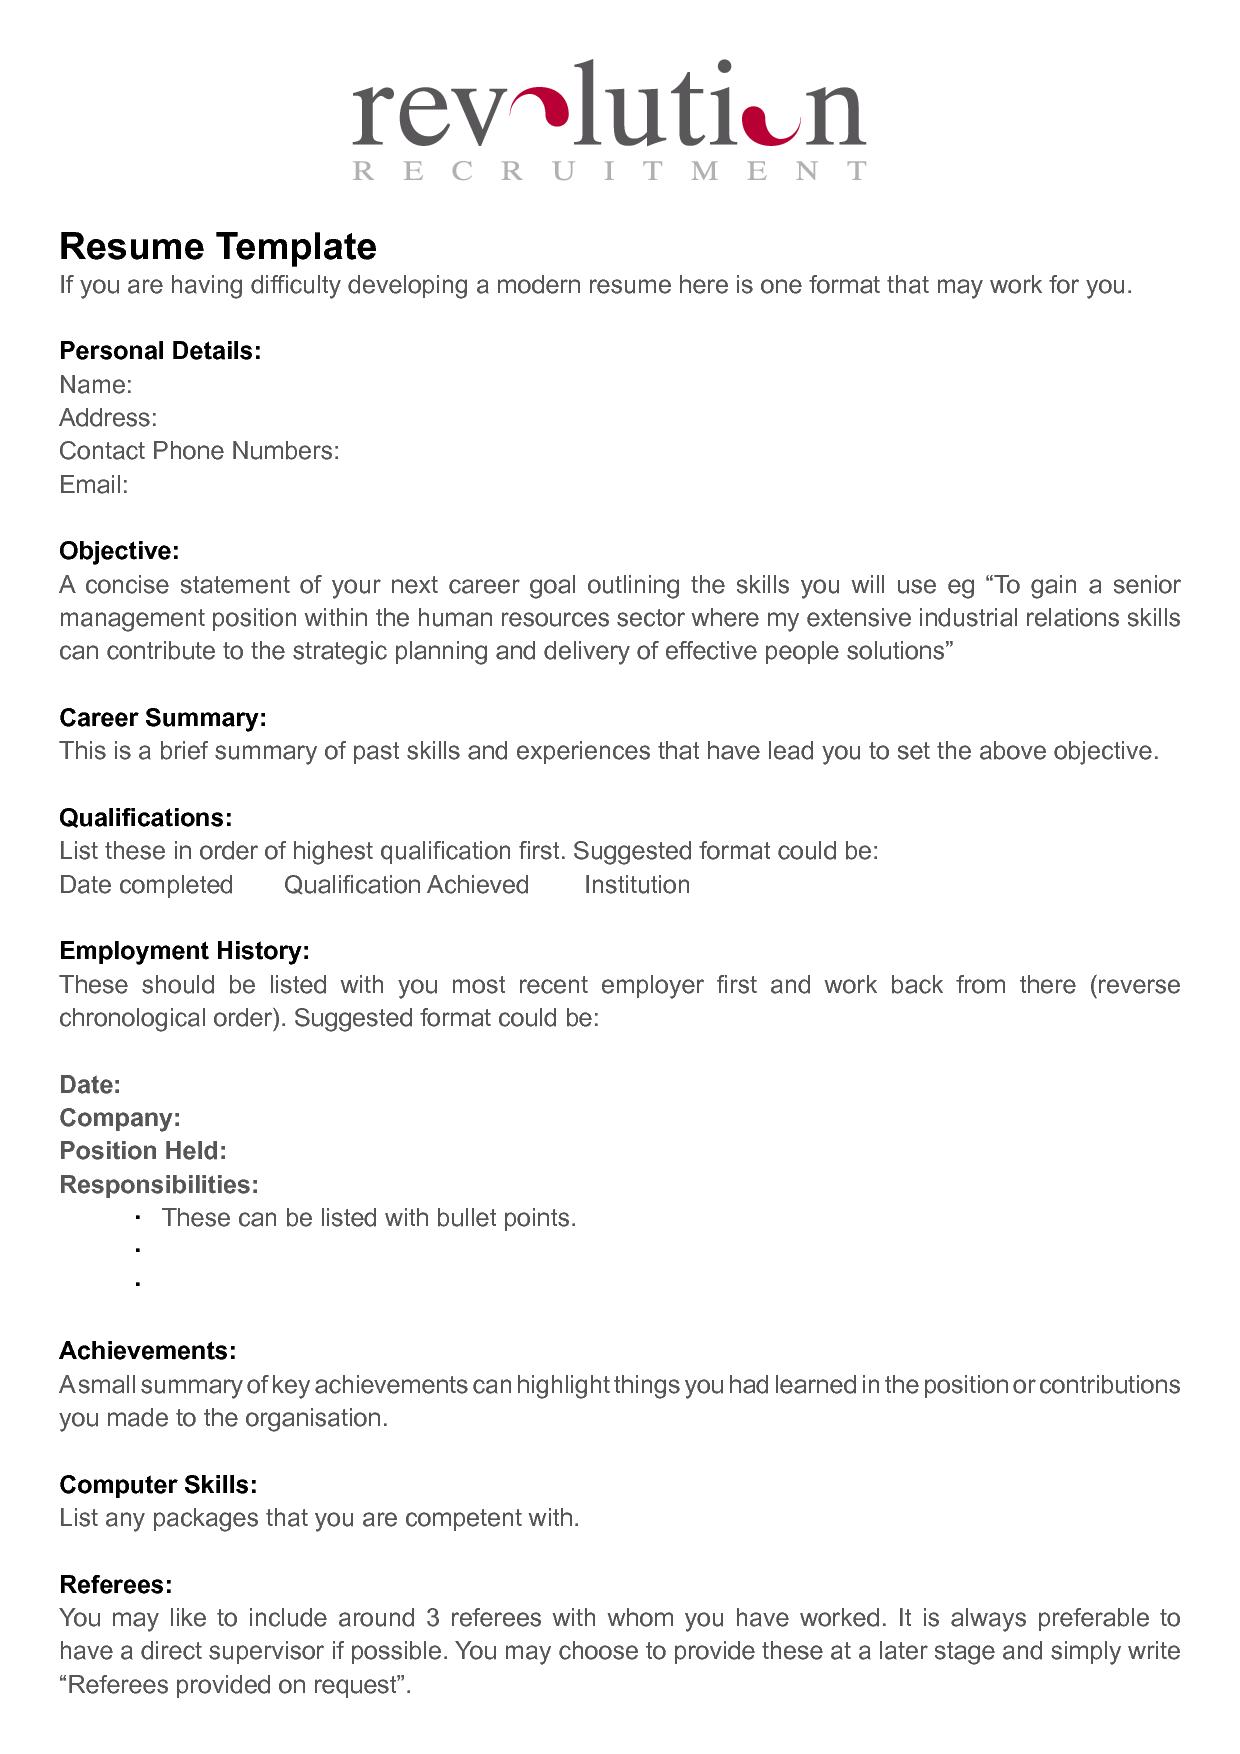 Computer Skills List For Resume Kristina Koromzay Kkoromzay On Pinterest